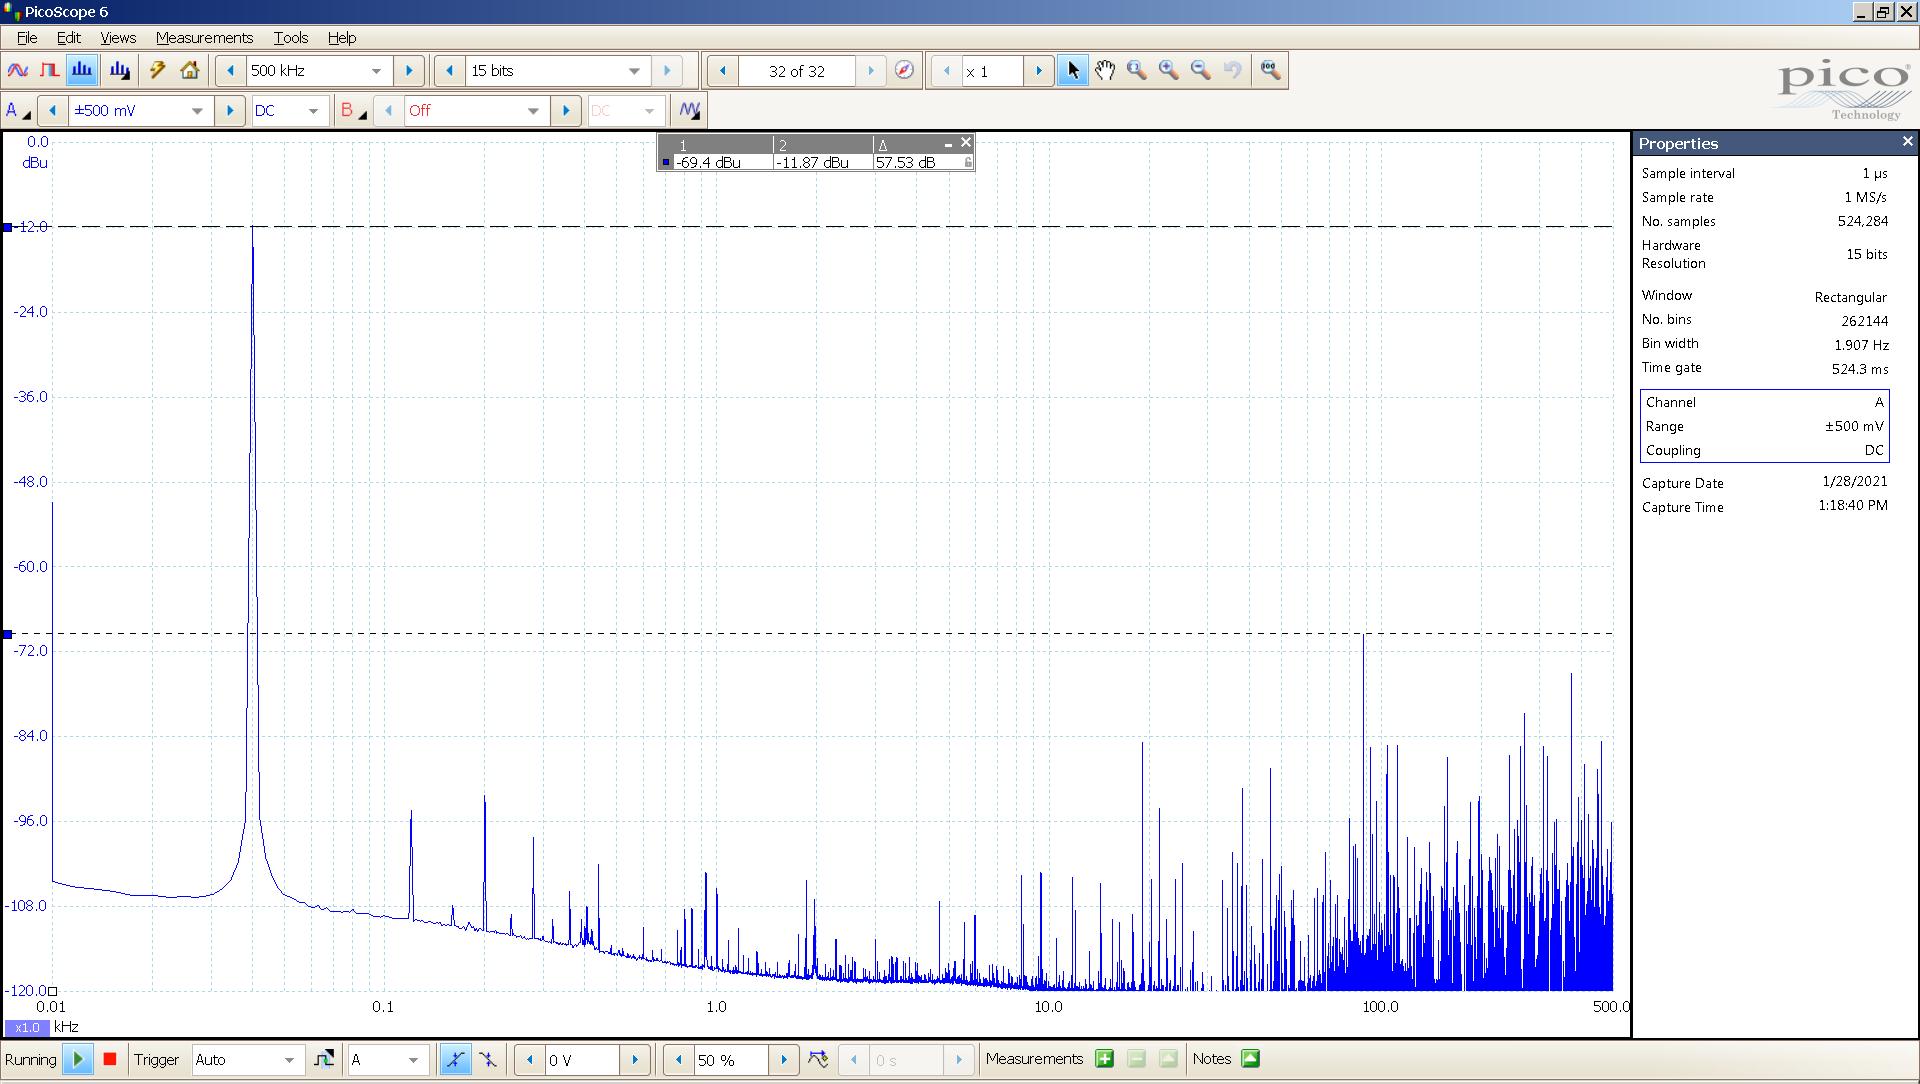 24 20210128 dac2541 40 Hz sine FFT -20dBFS 88K USB SE Slow.png